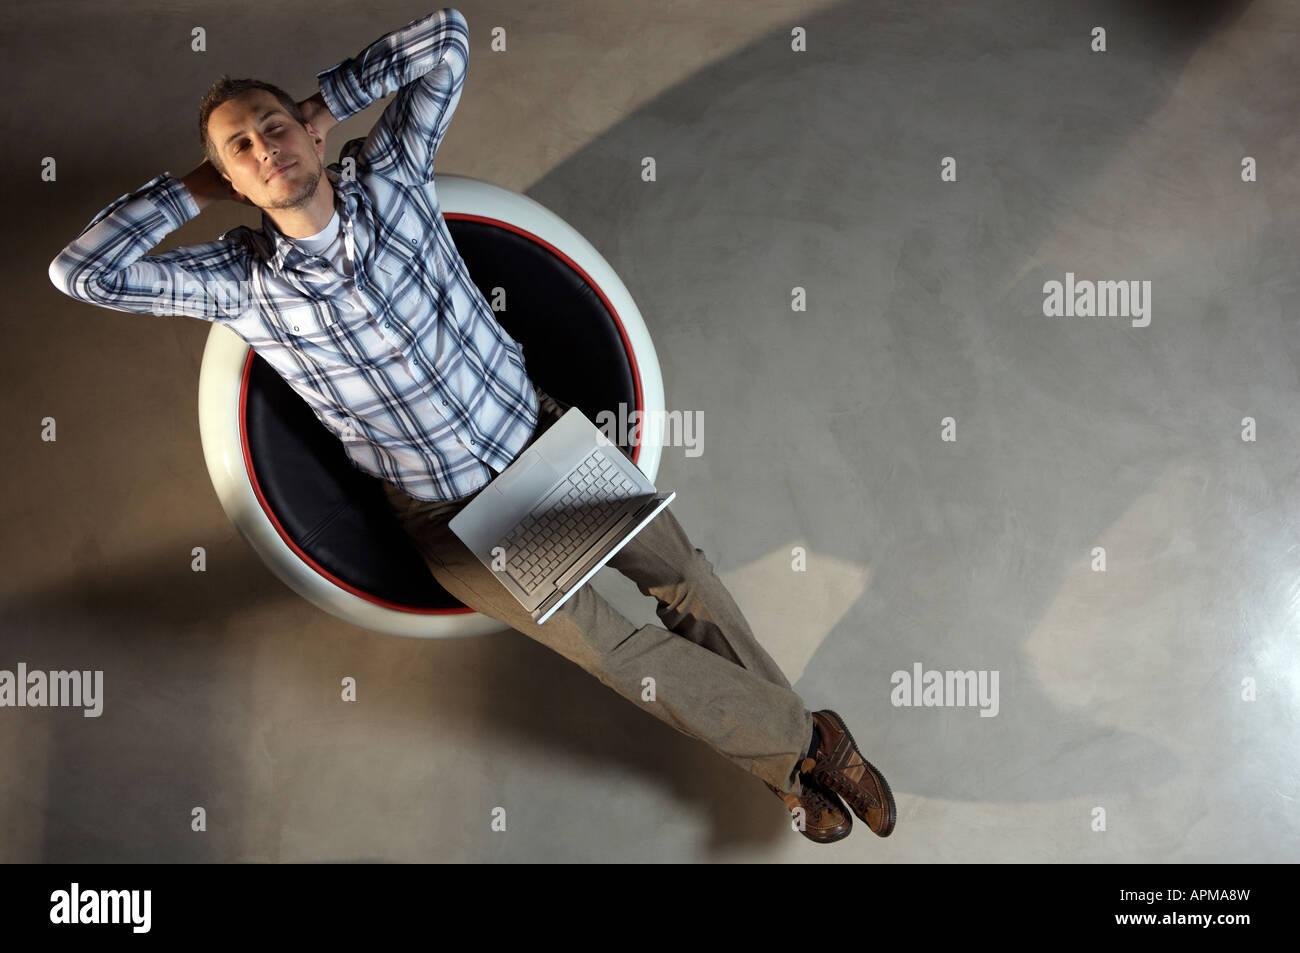 Hombre con un portátil Imagen De Stock